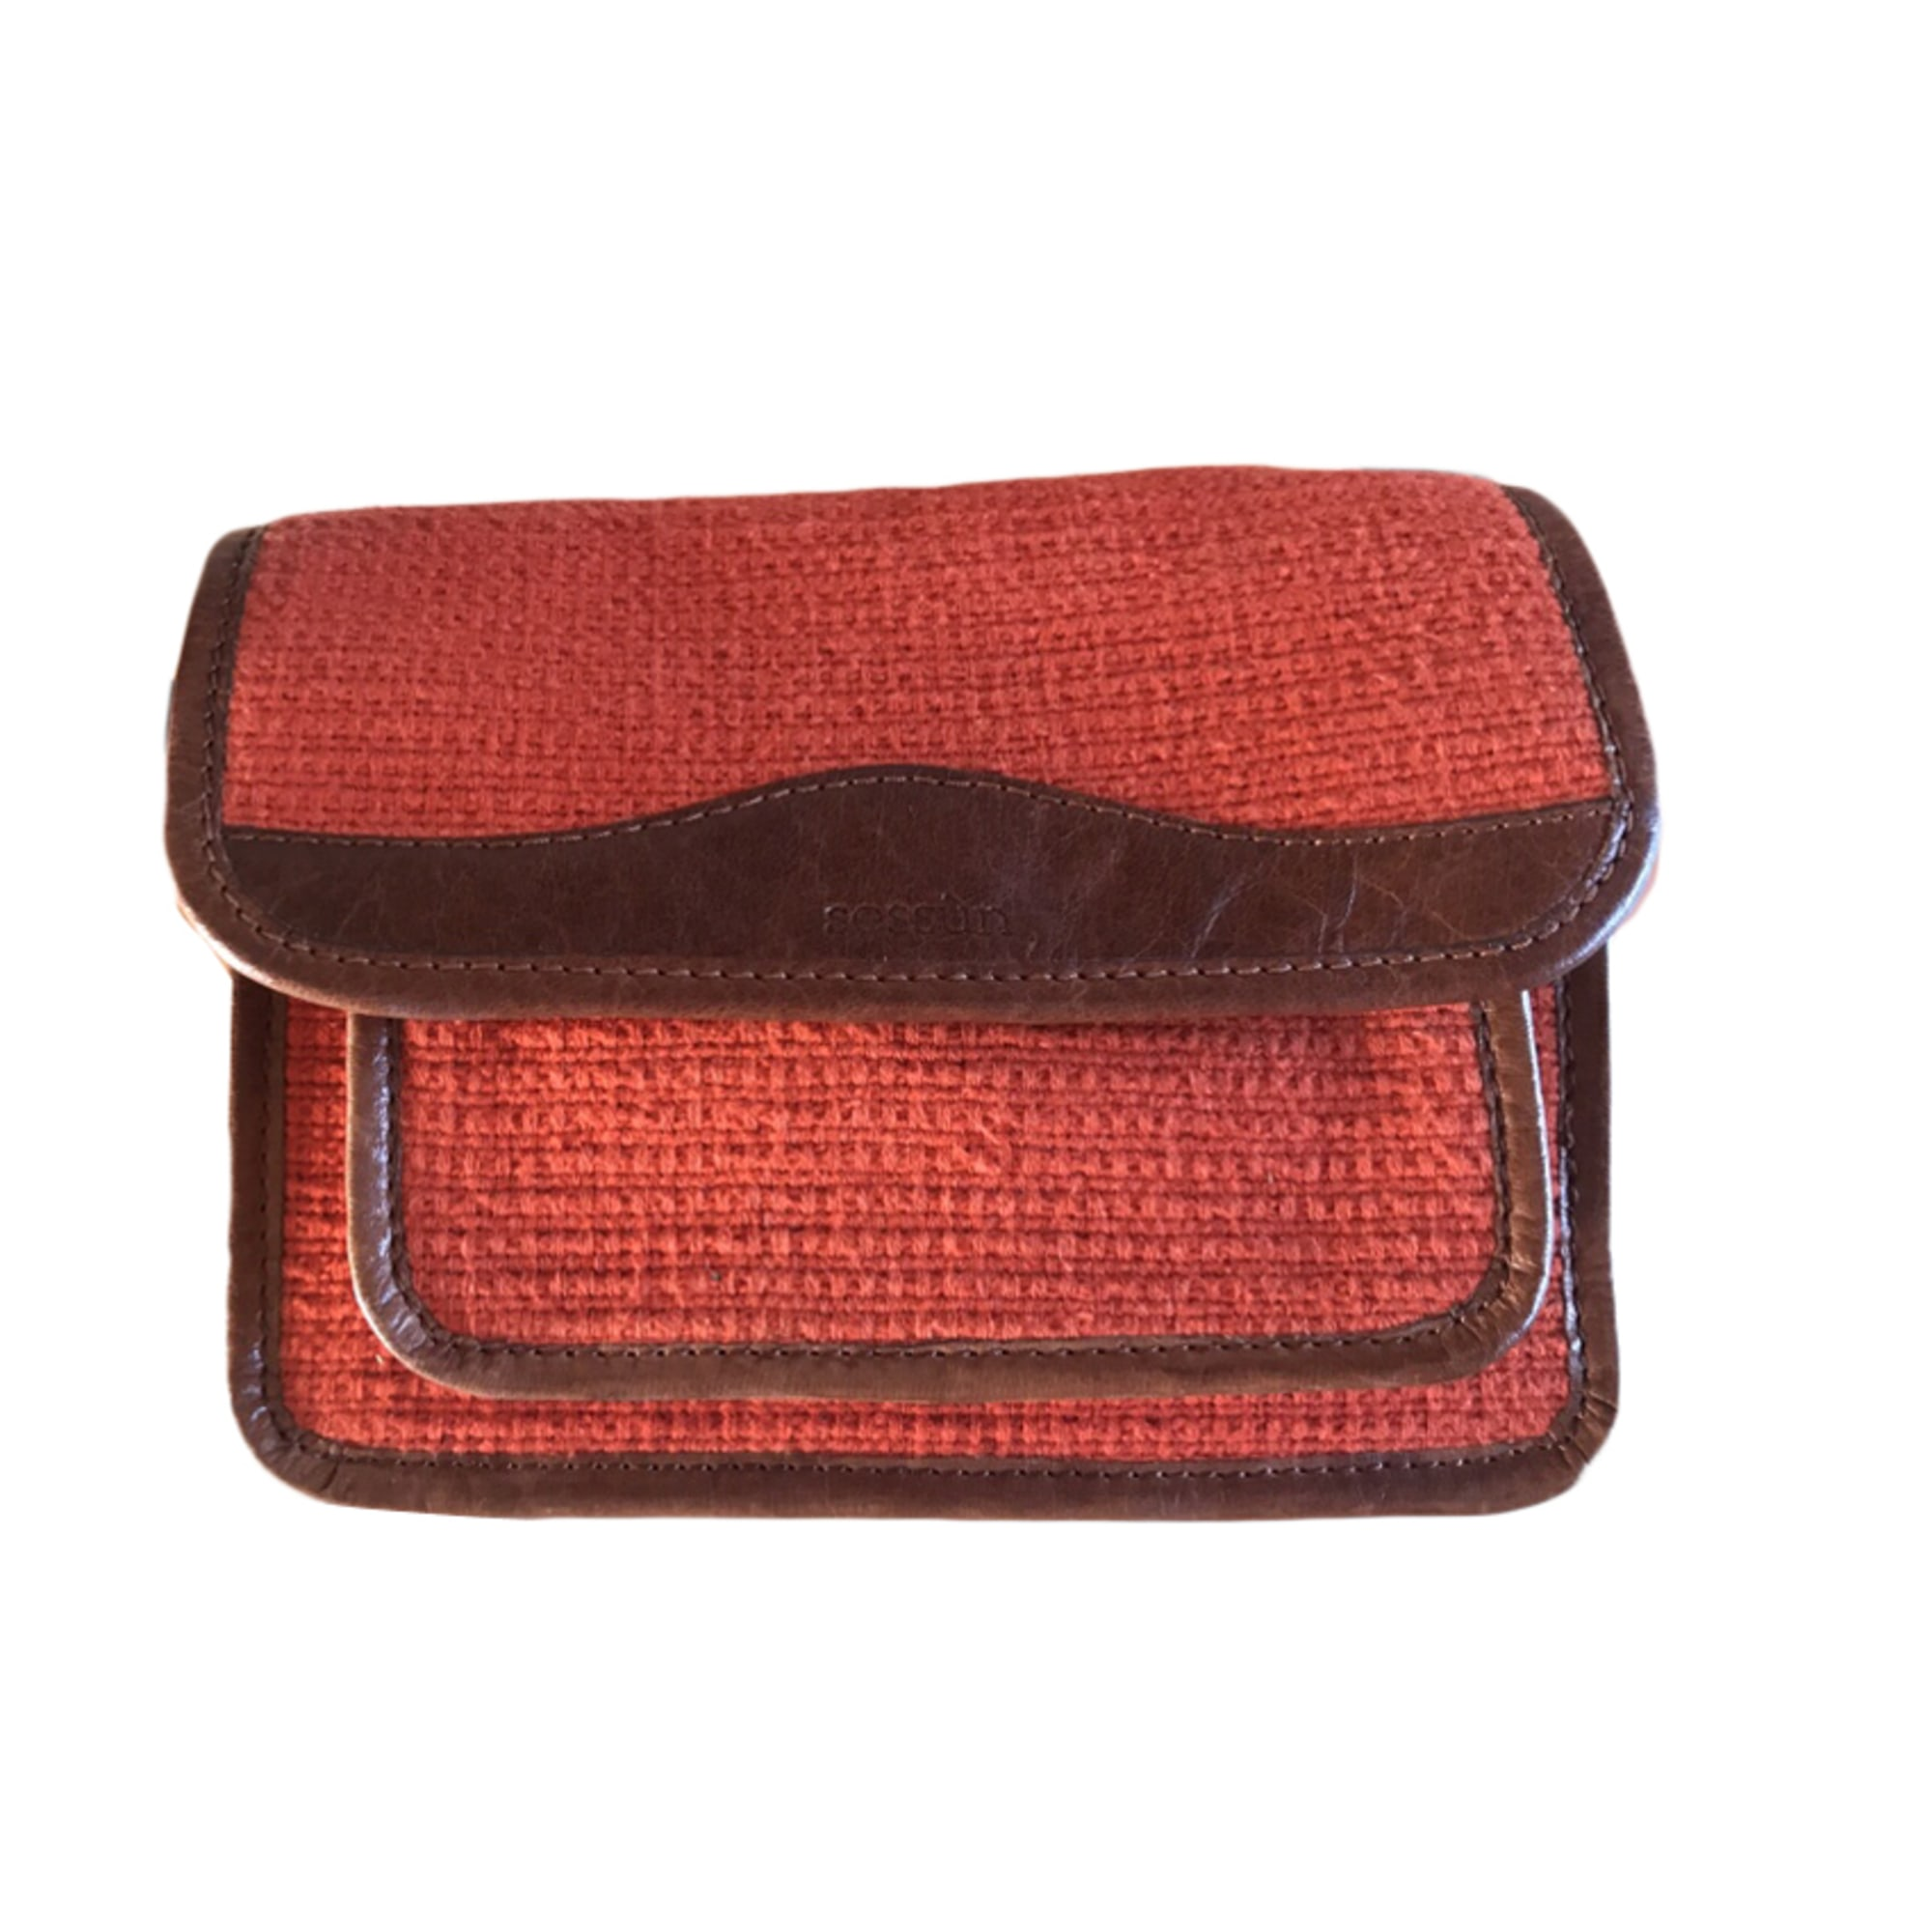 Sac à main en tissu SESSUN coton orange